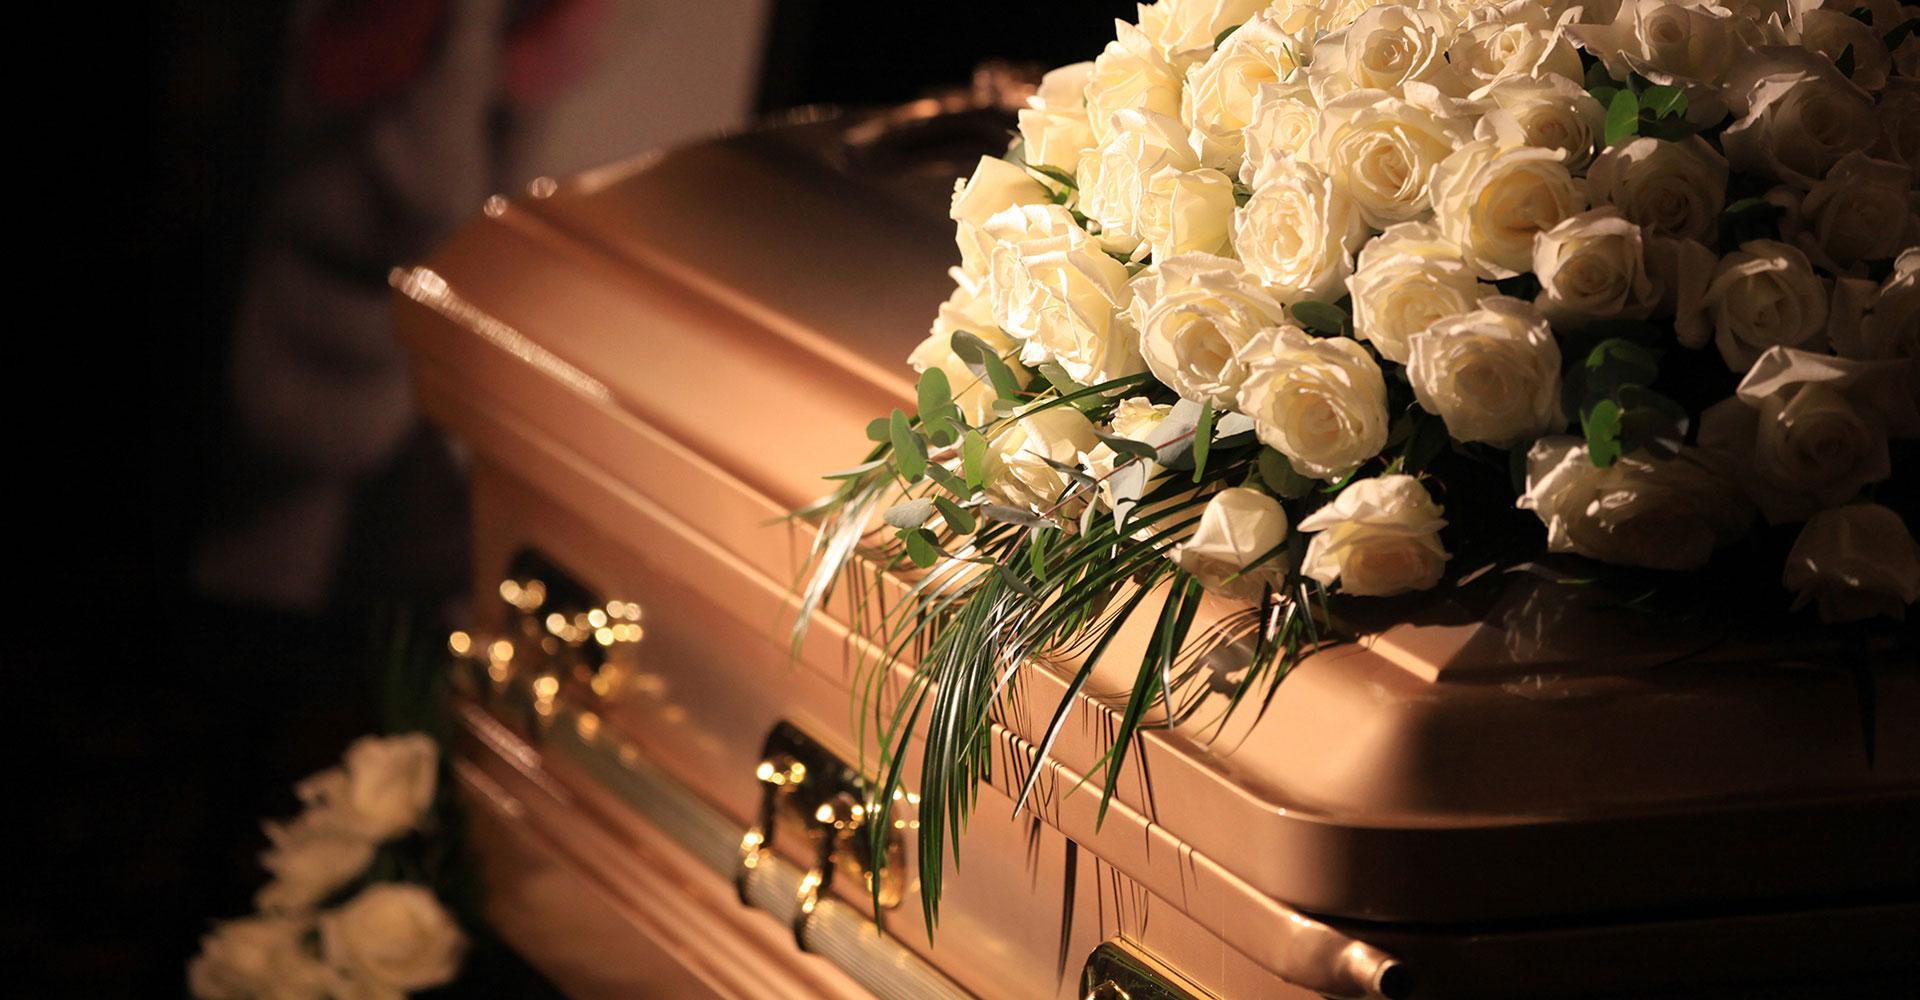 Funeral Service Provider